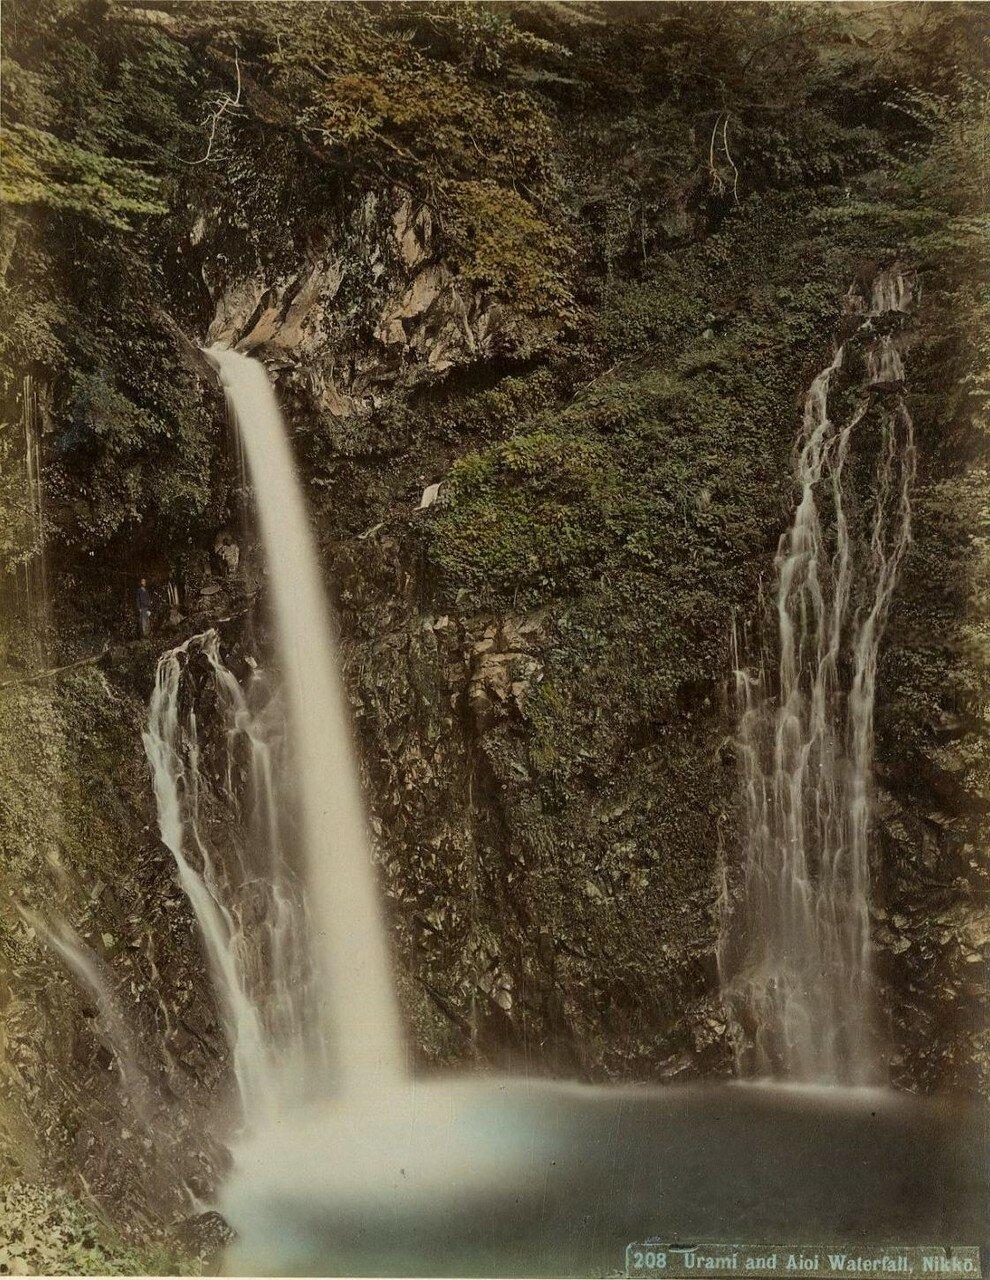 Окрестности Никко. Водопад Урами